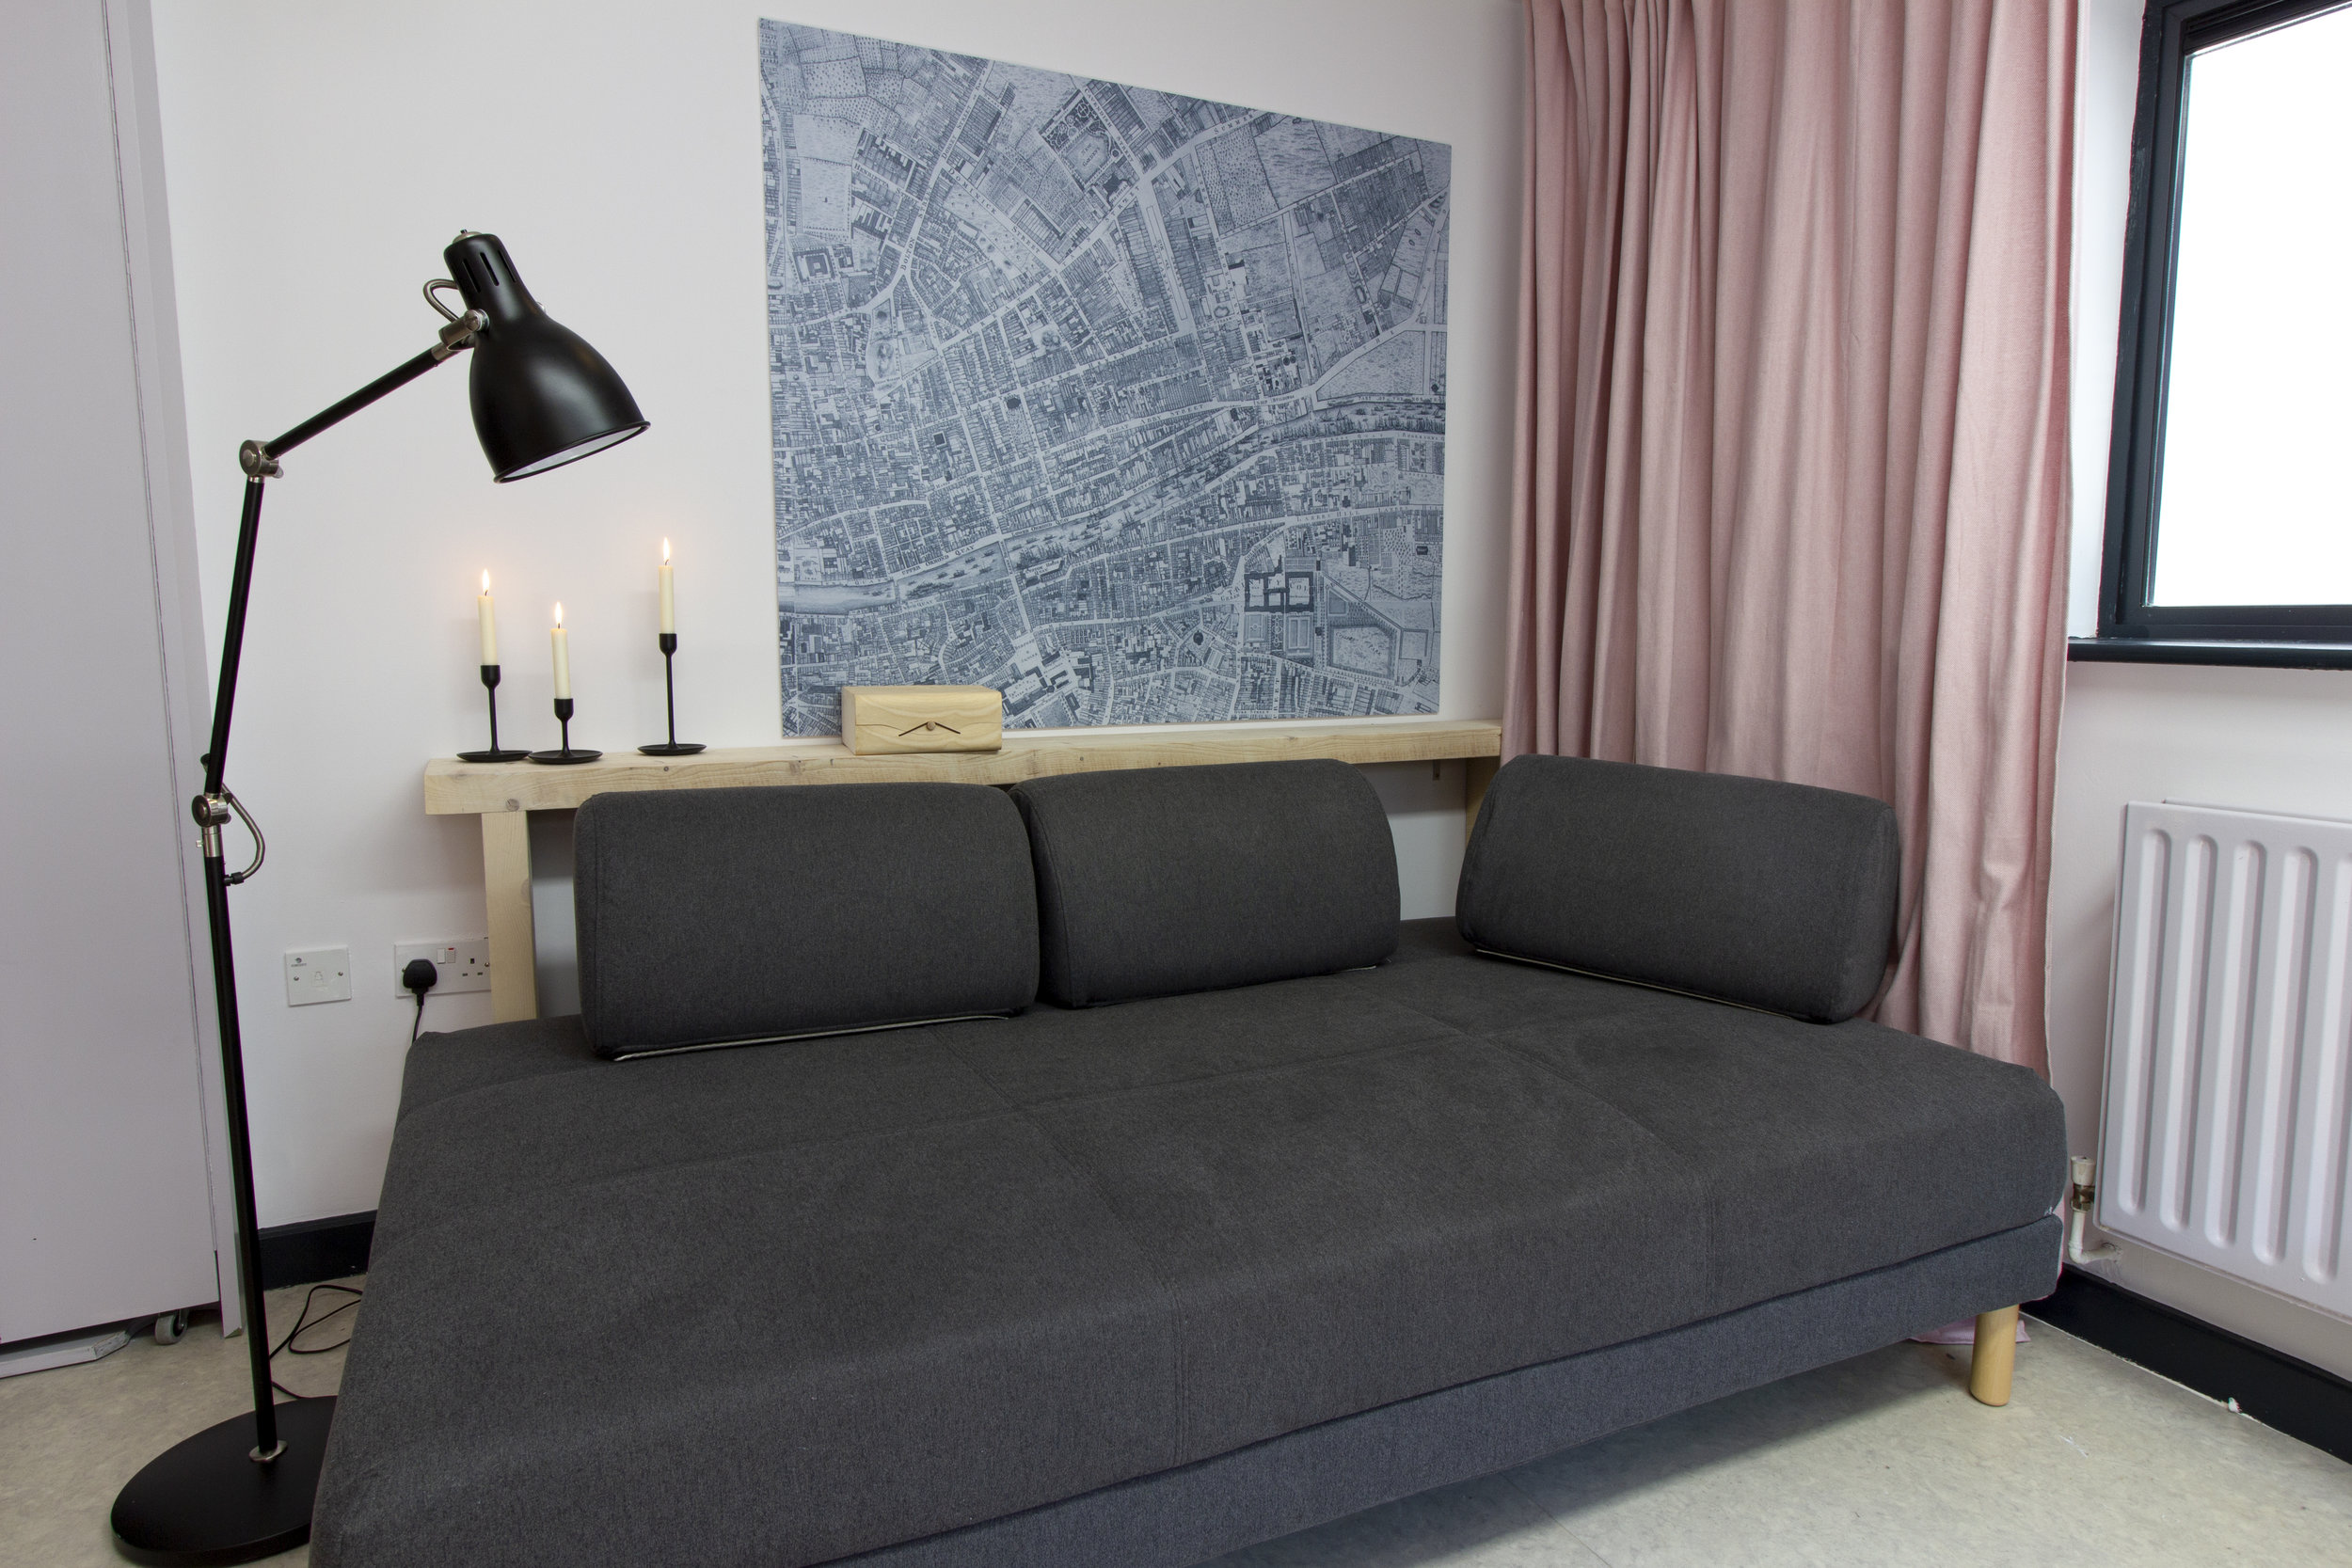 HR - Dublin 1 - After - Living Room Kitchen 17.jpg